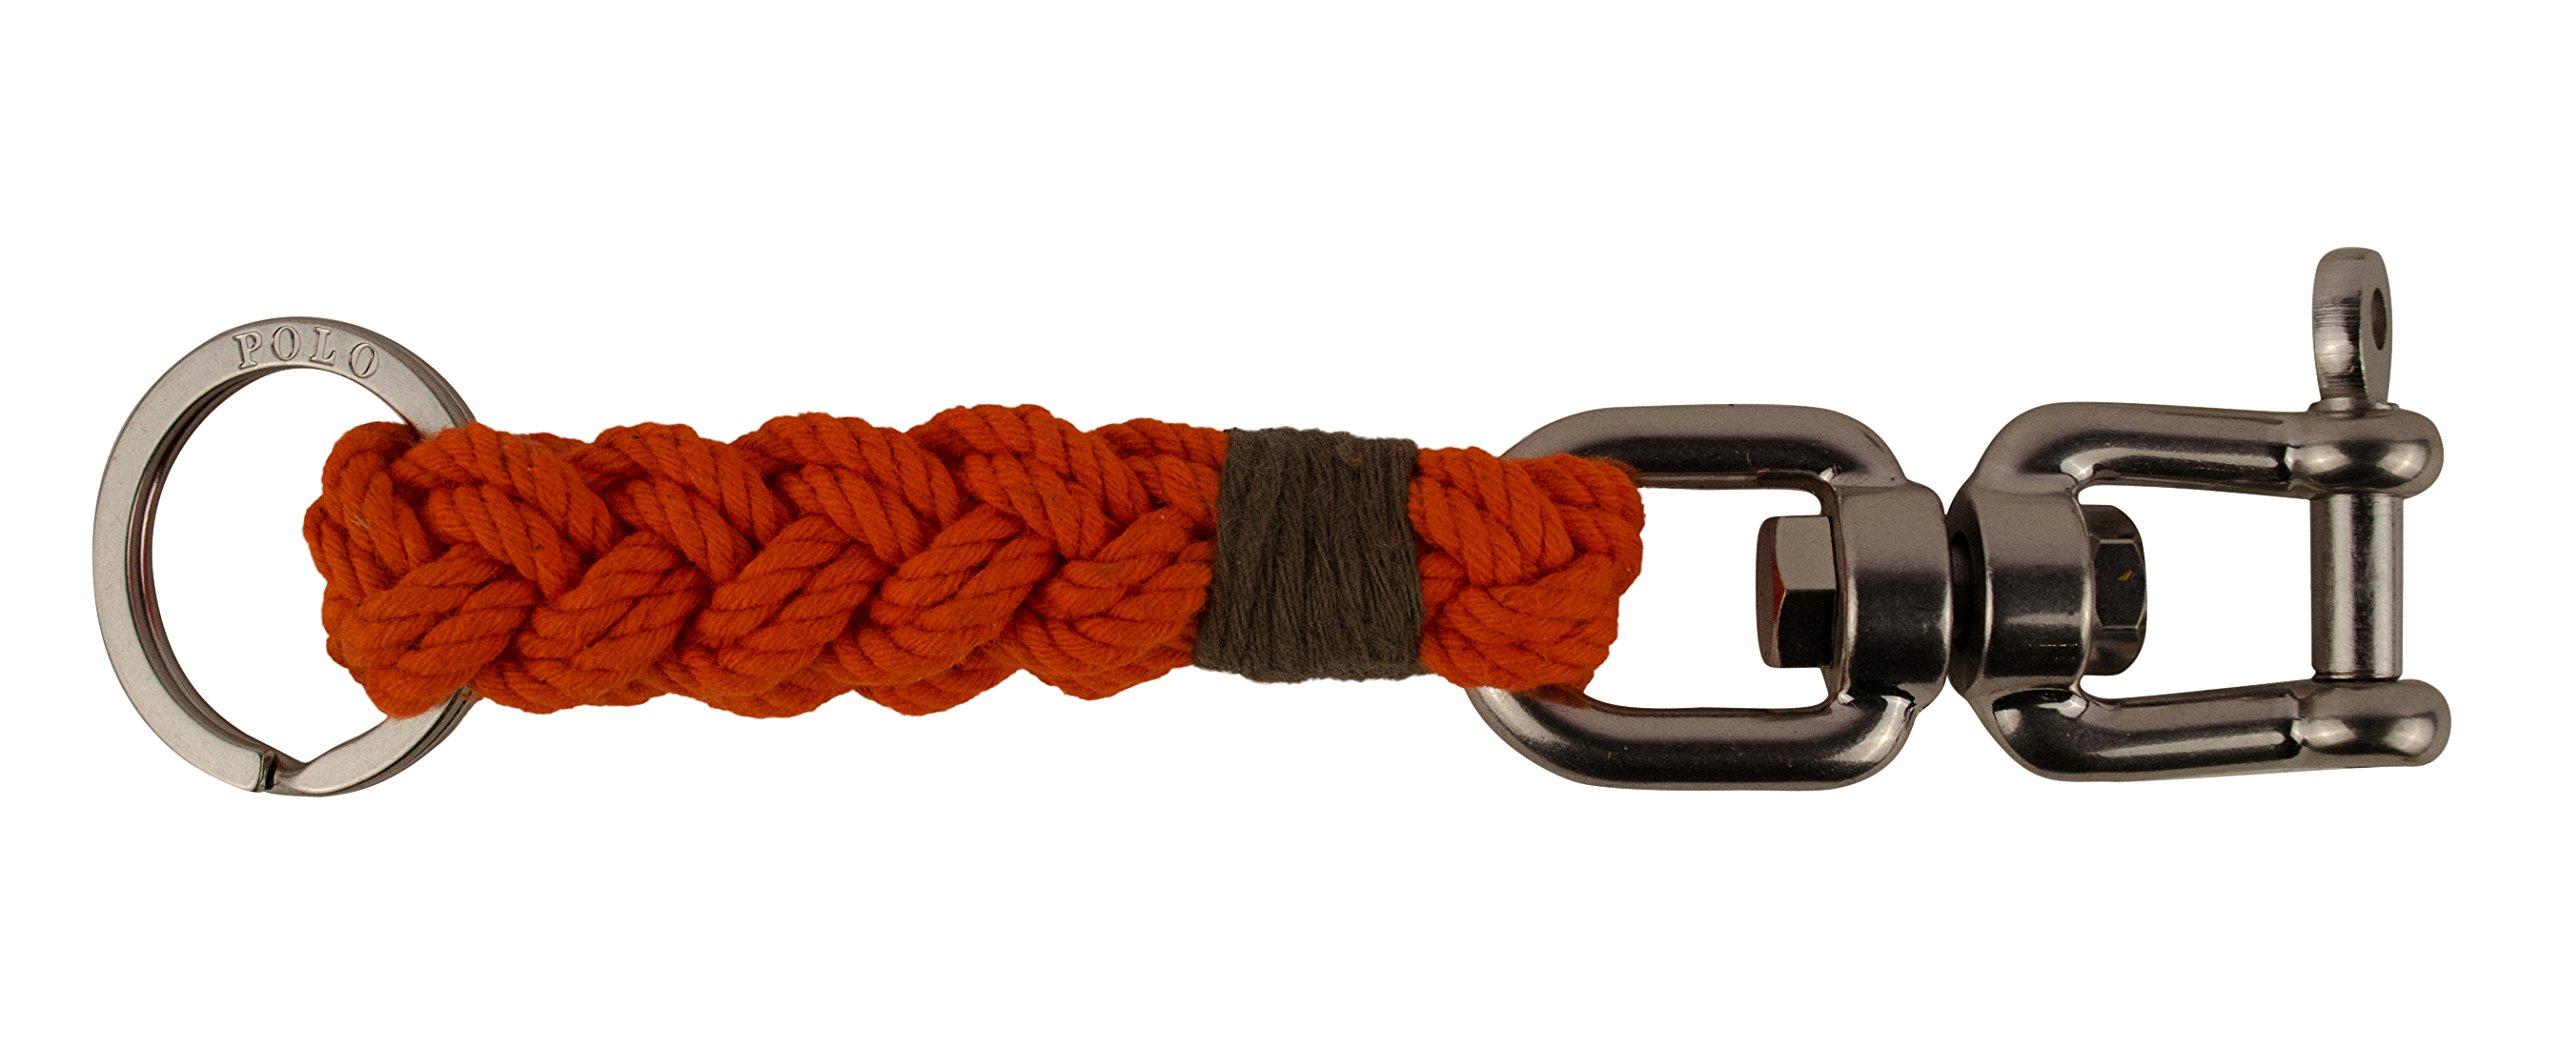 Polo Ralph Lauren Swivel Pin Braided Key Fob Key Chain-O-OS